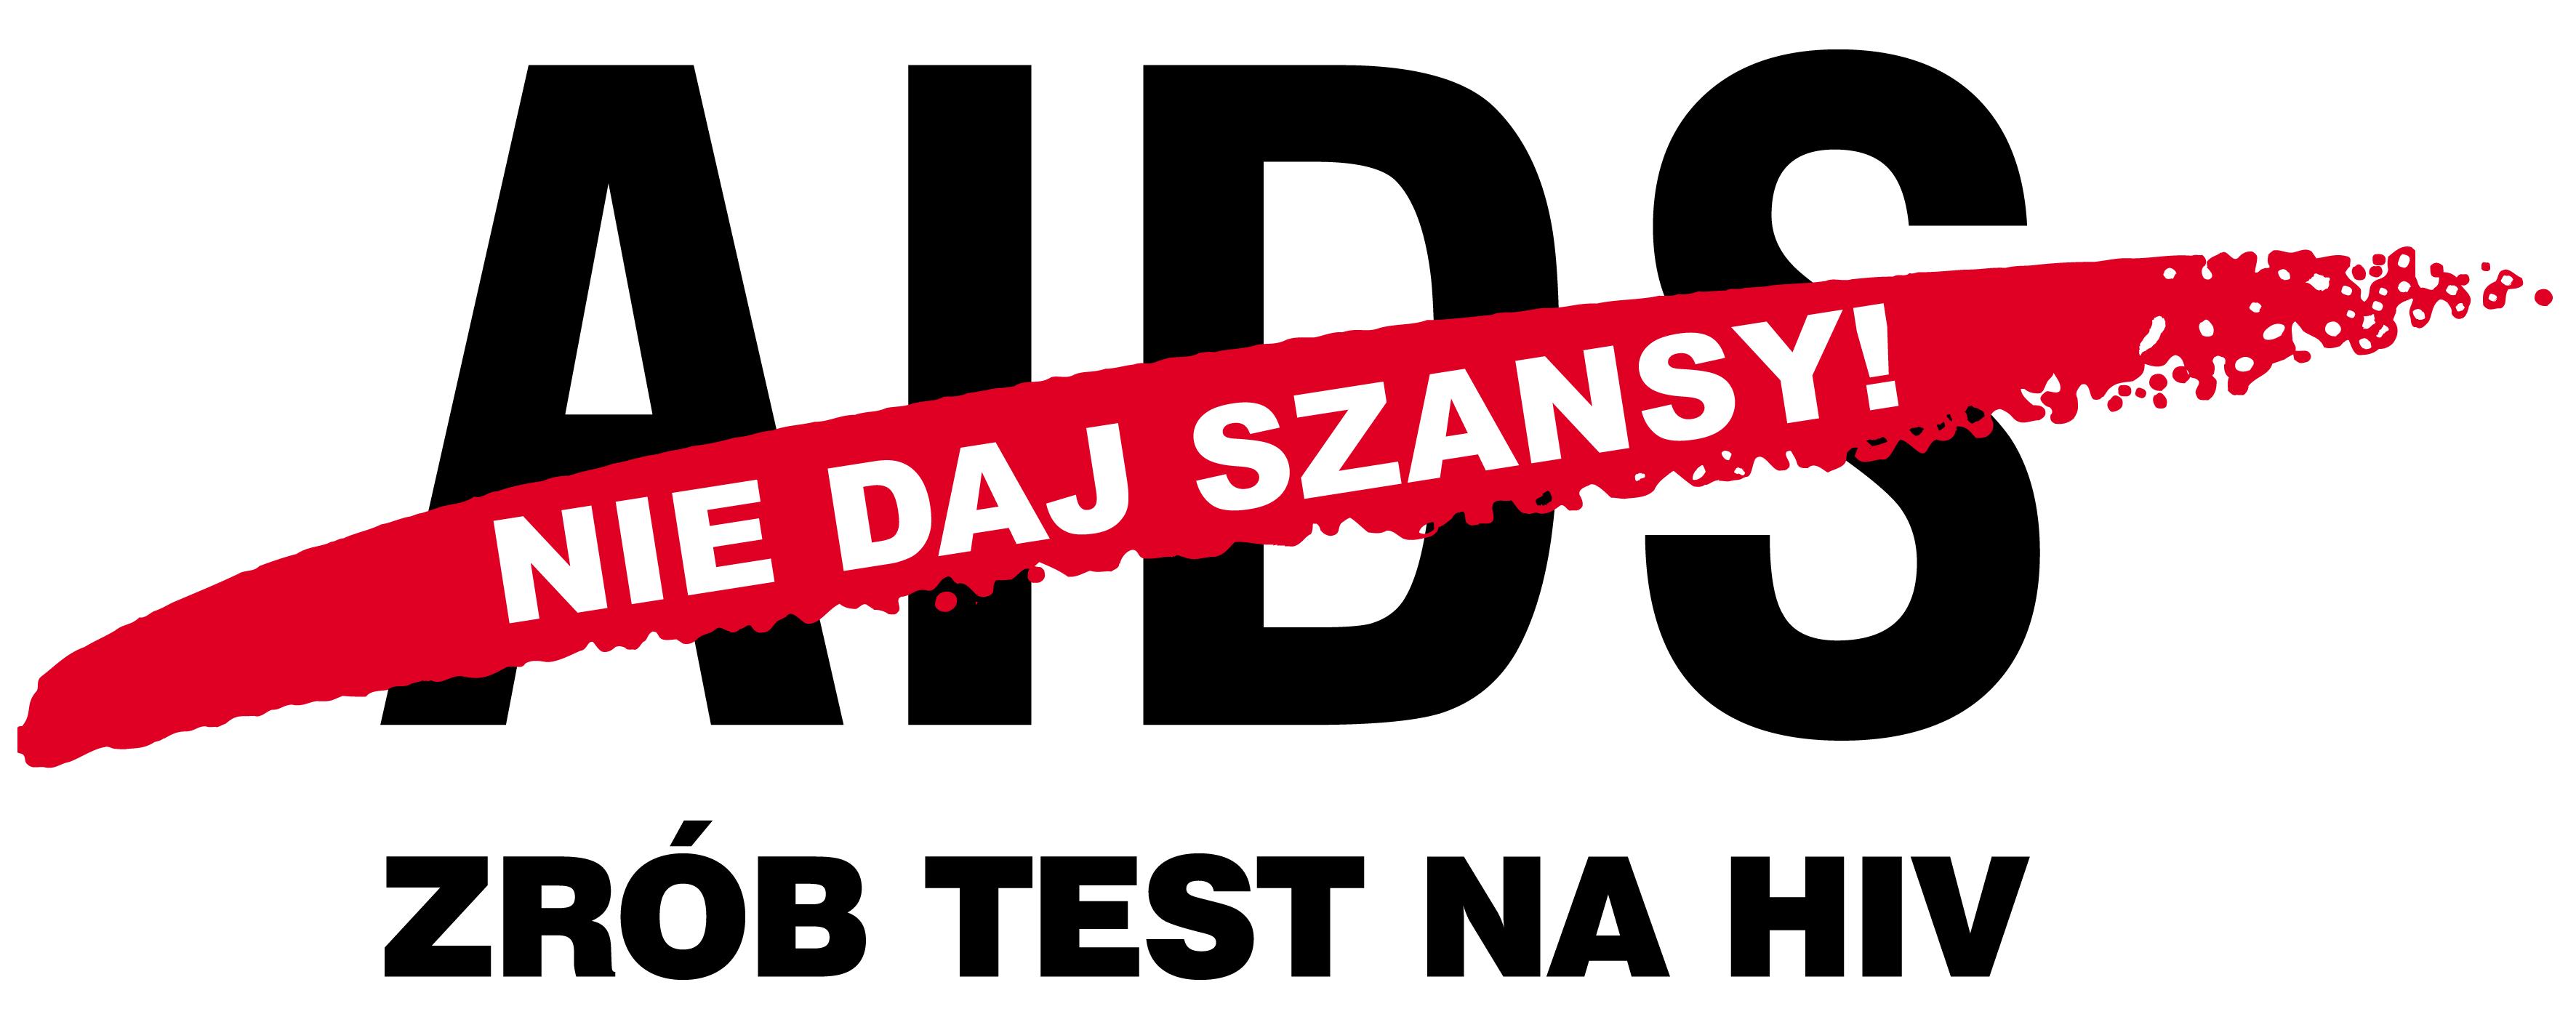 Wróć Bez Hiv Krajowe Centrum Ds Aids Kampania